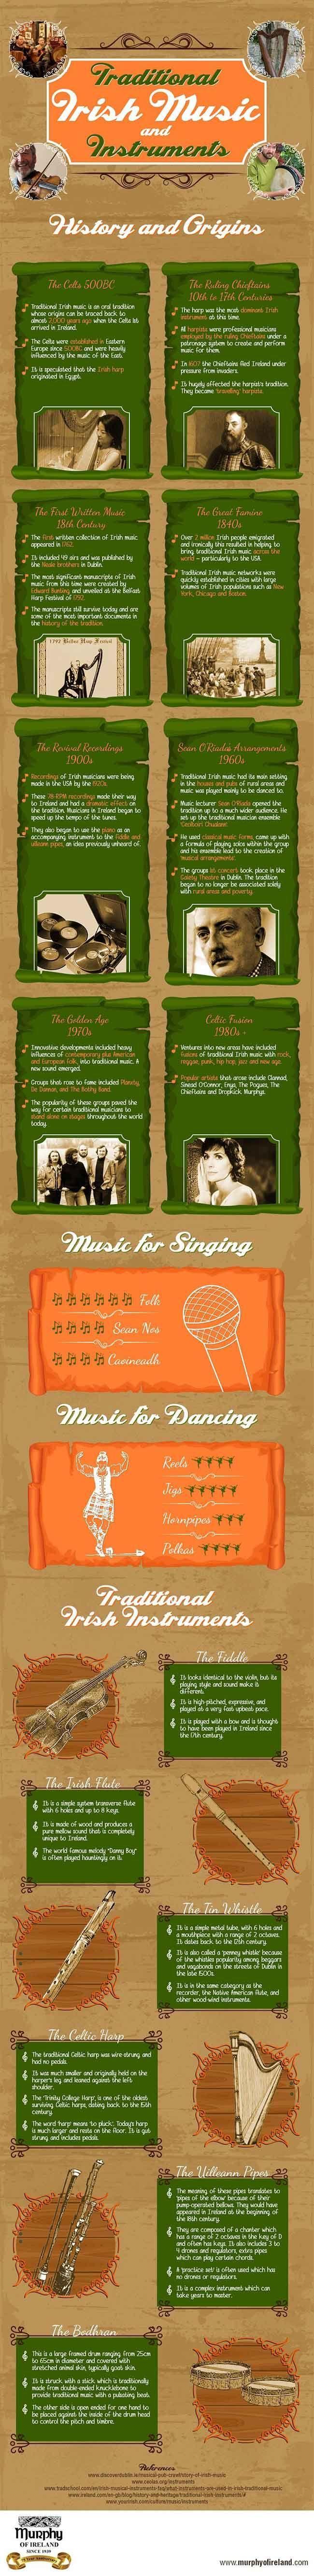 The history and origins of traditional Irish music - IrishCentral.com